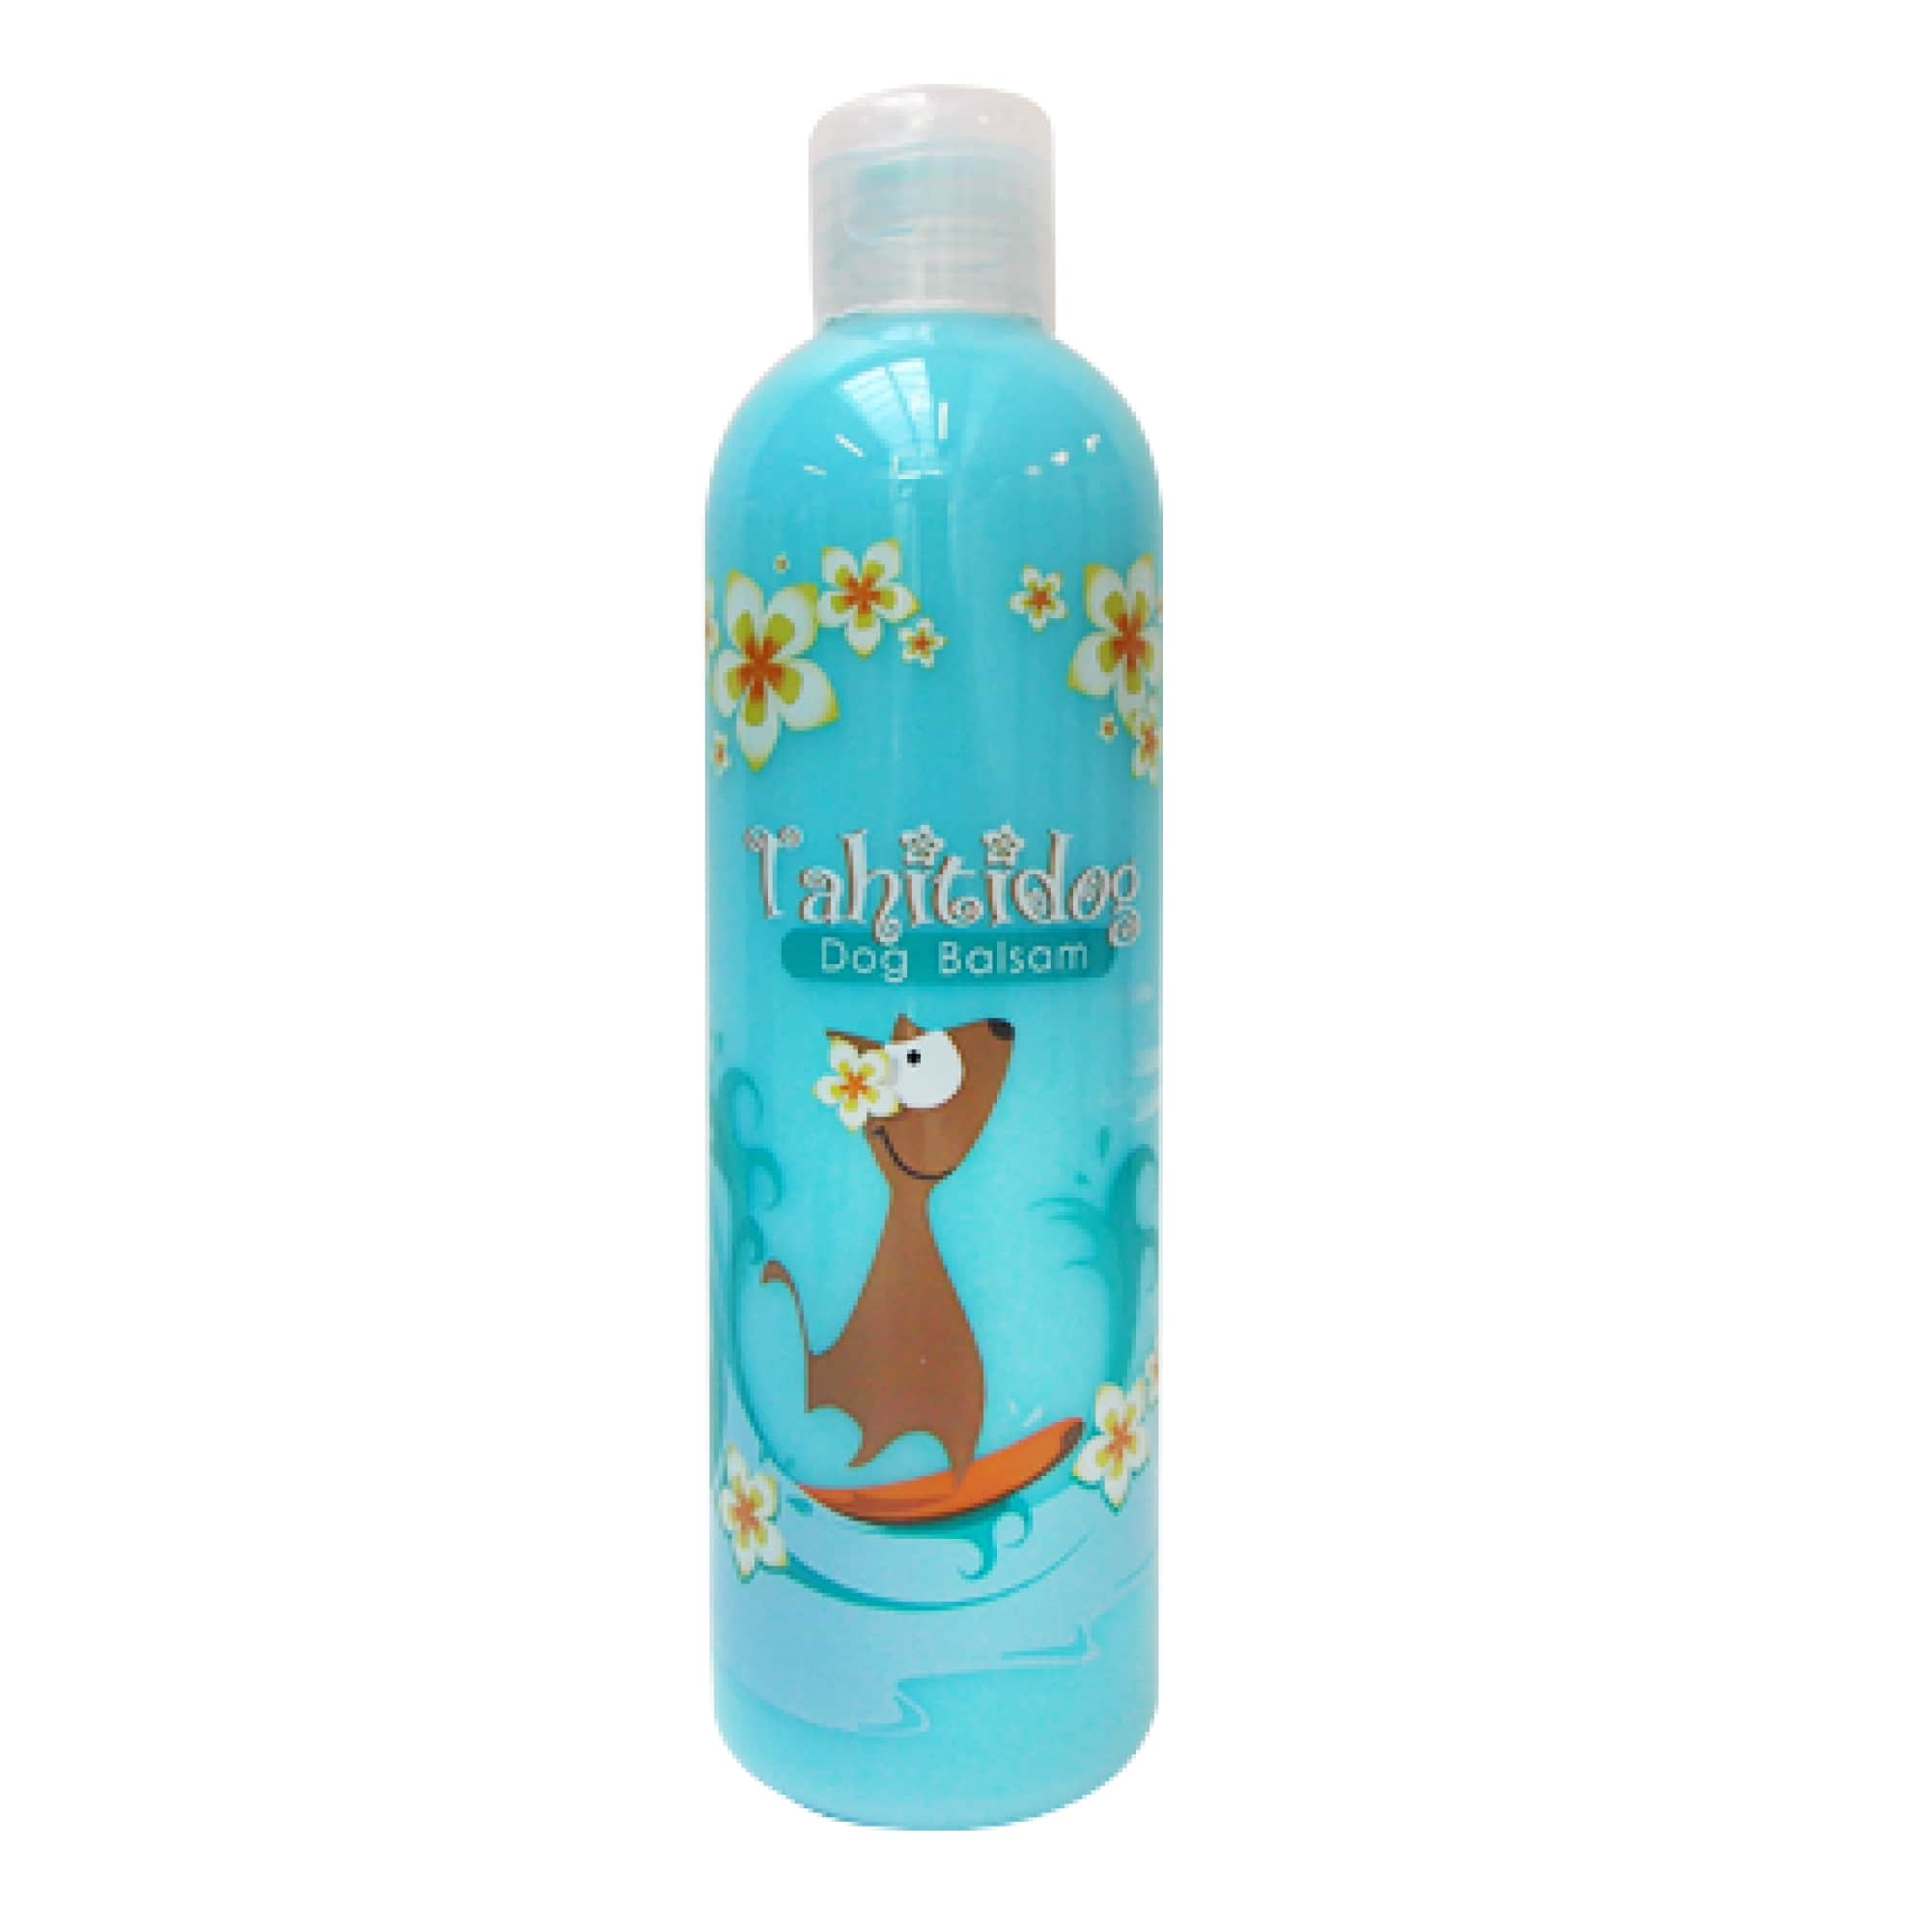 Après-shampooing Diamex Tahiti Dog balsam